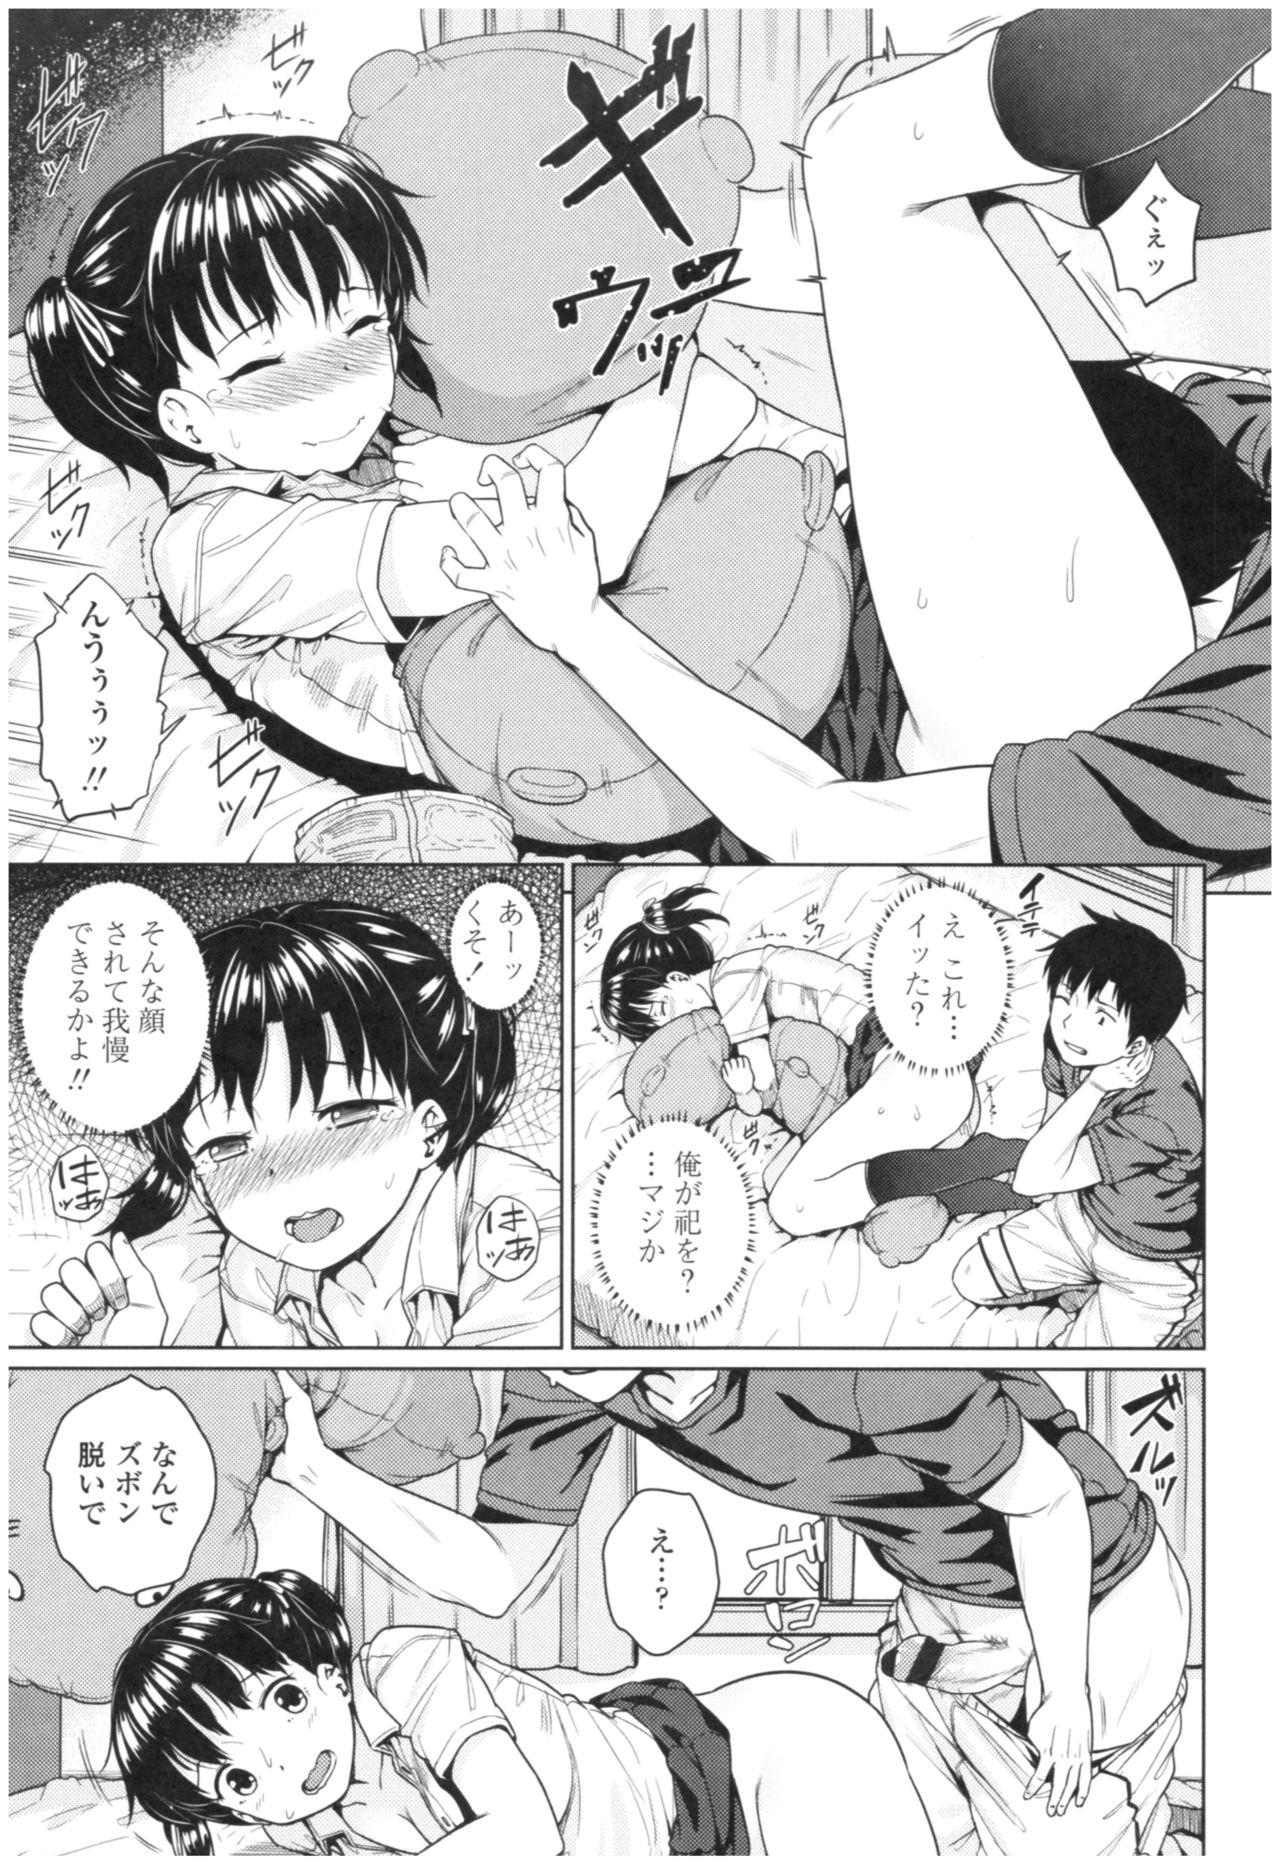 Bitch Kanojo no Hatsukoi Jouji - Her Lewd First Love and SEX 143